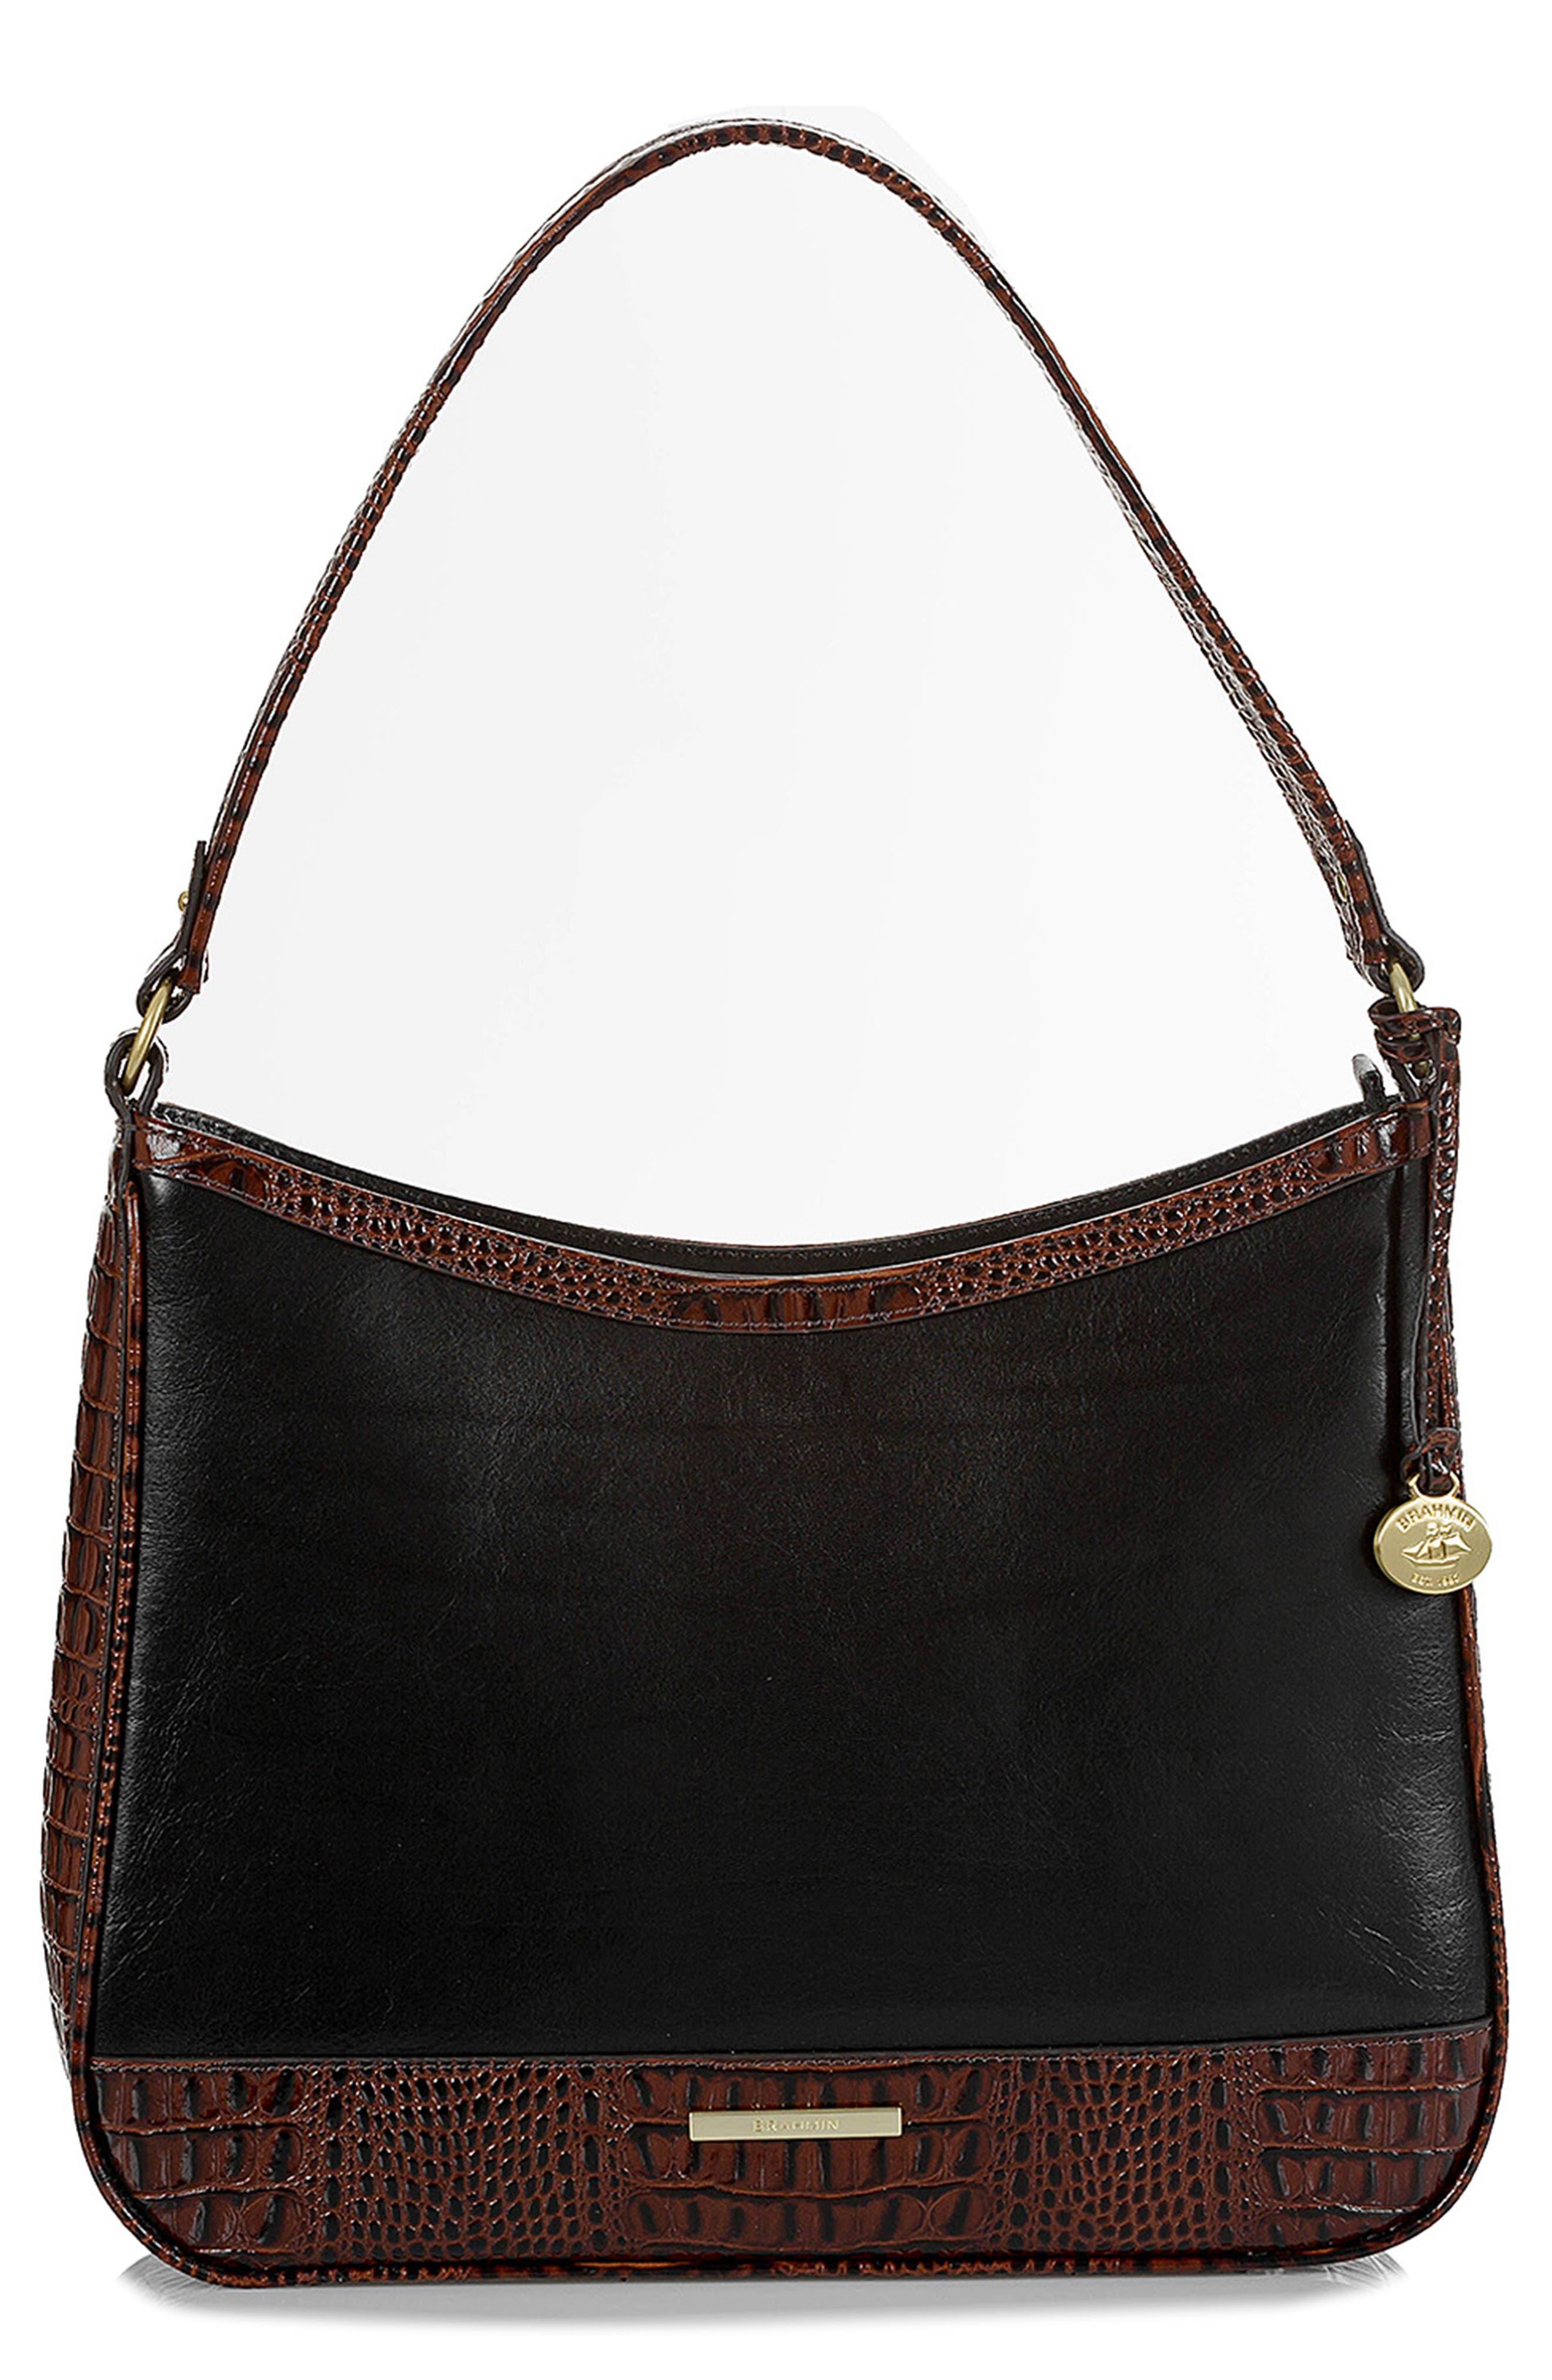 Noelle Leather Hobo Bag,                             Main thumbnail 1, color,                             Black